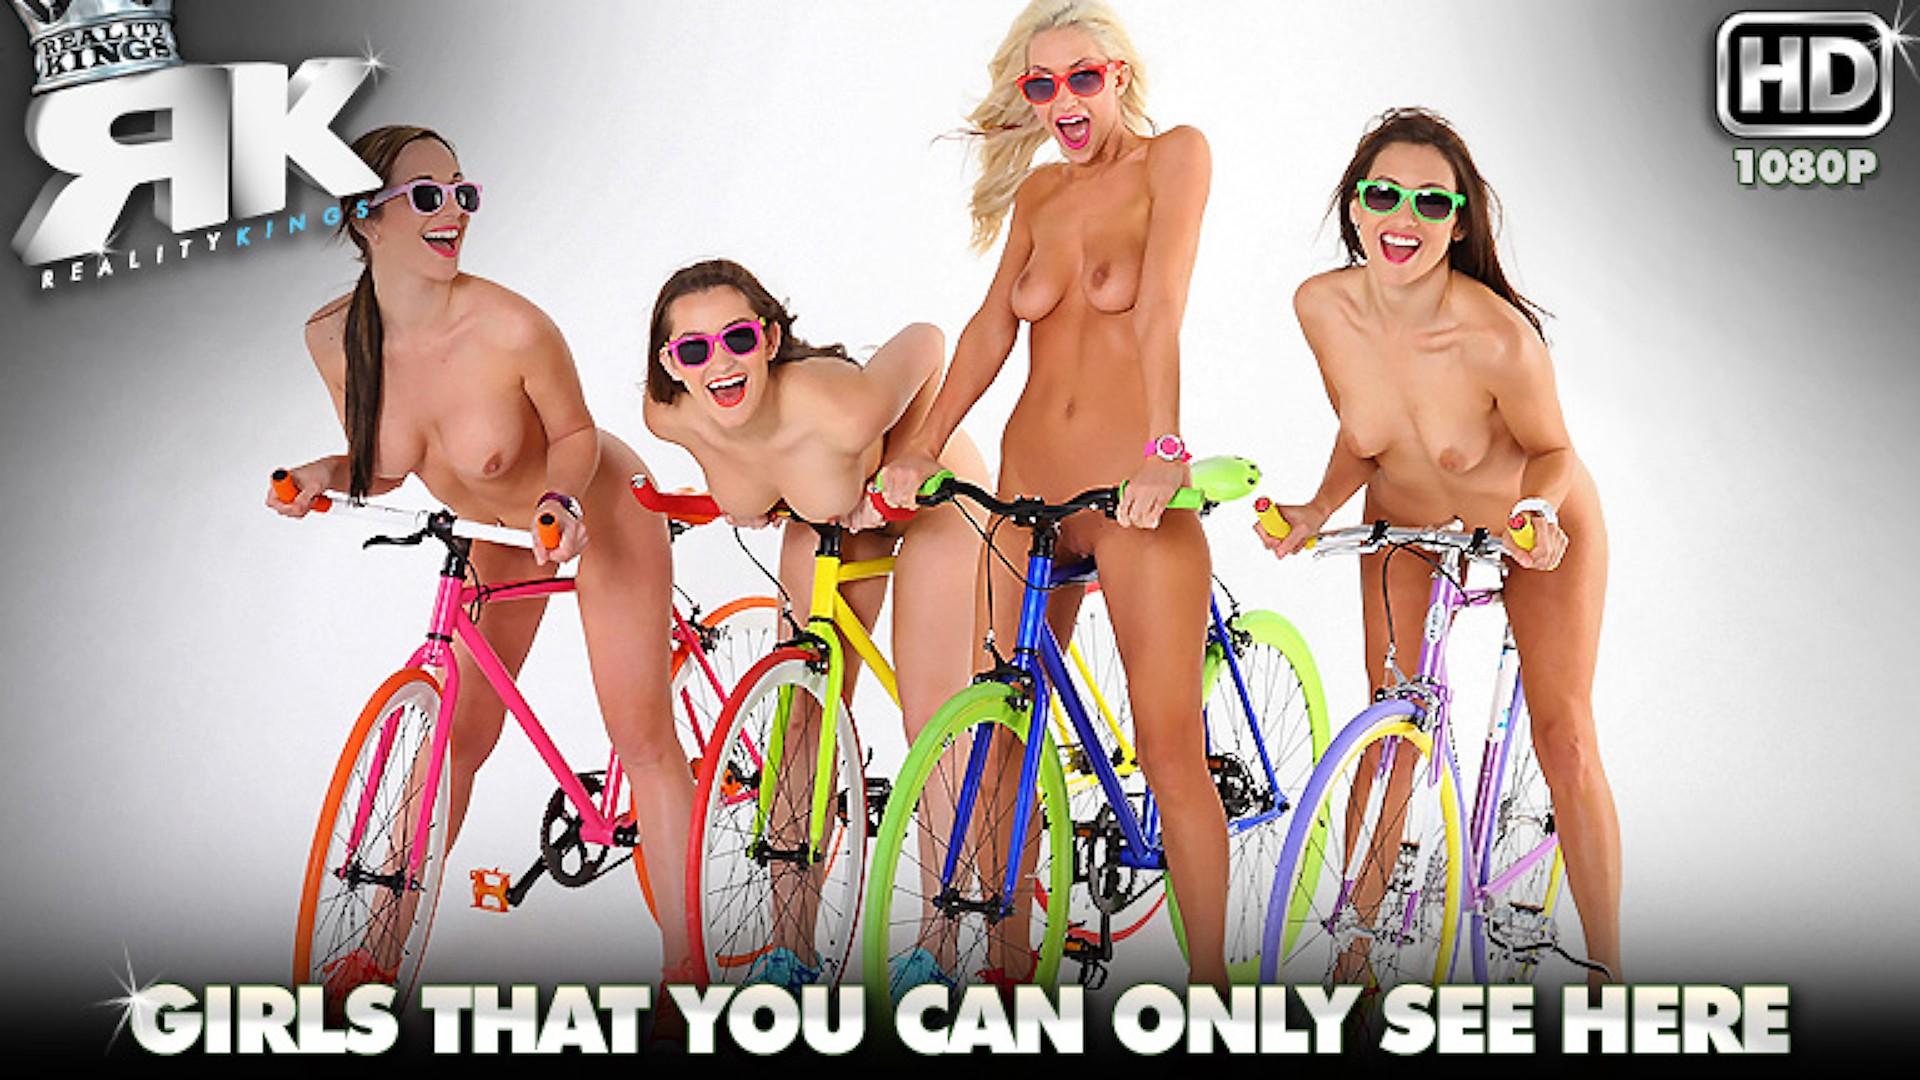 Bikes And Broads - We Live Together